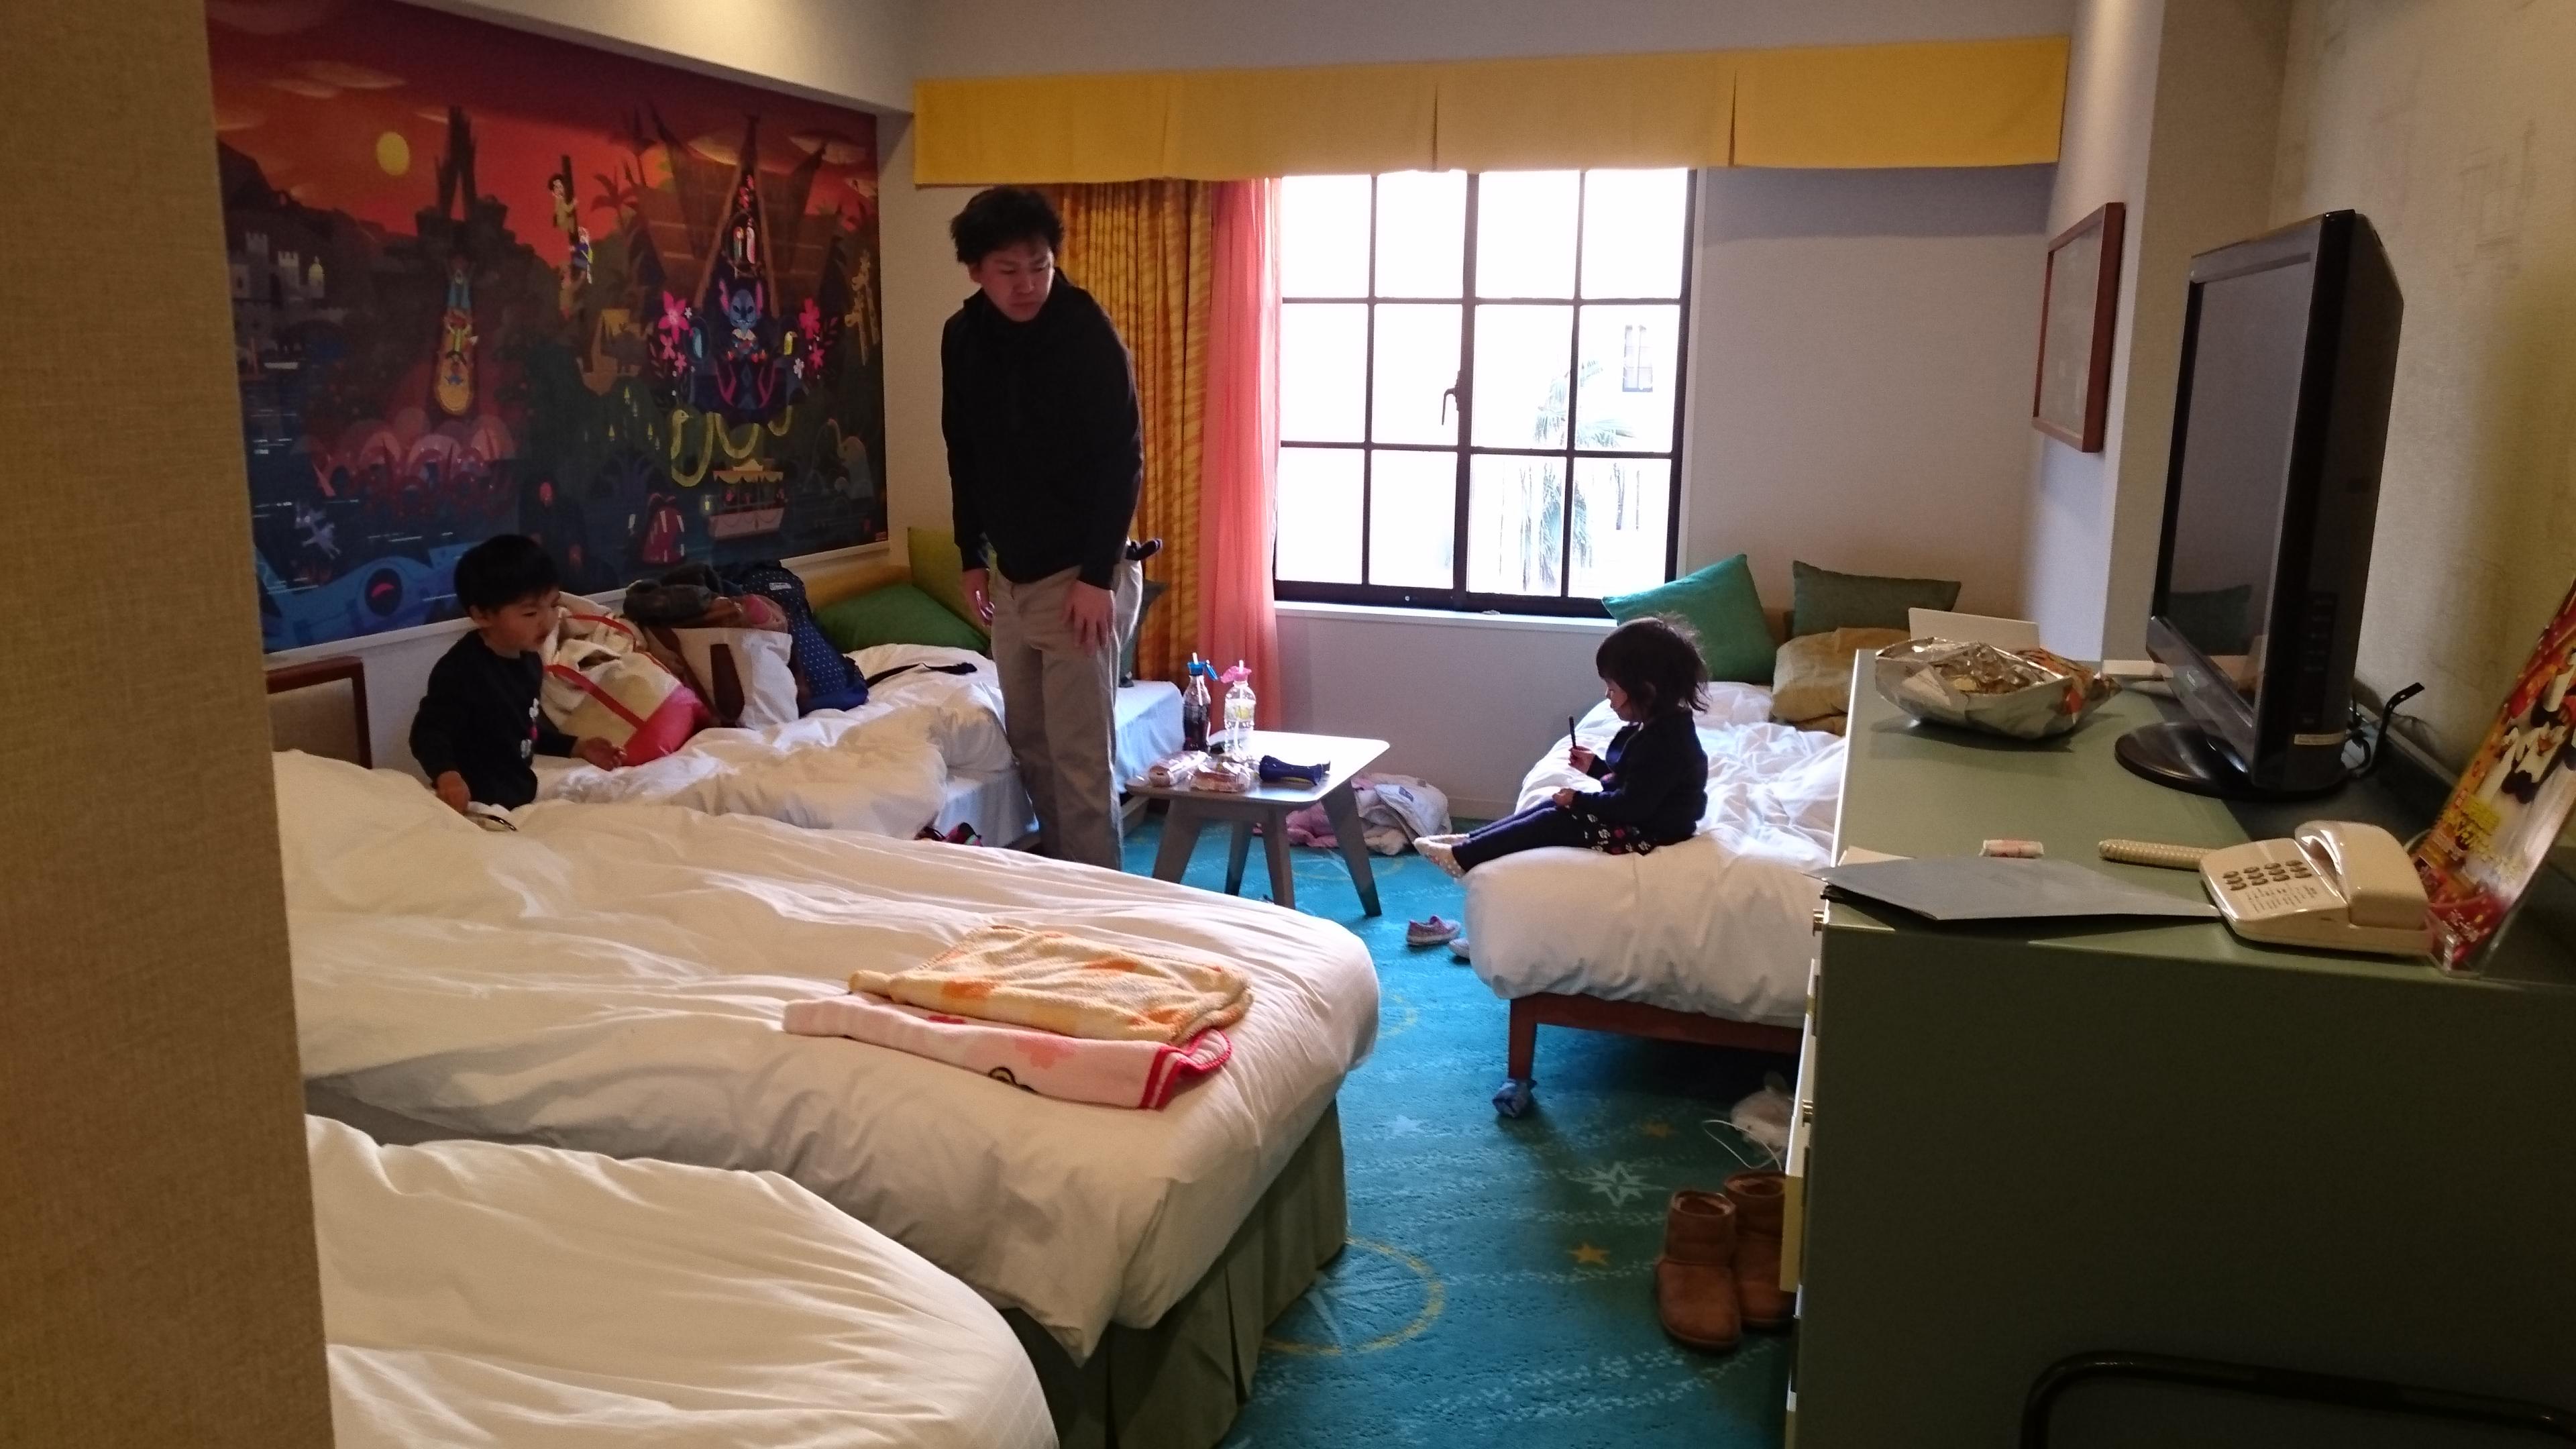 tdrオフィシャルなのに安い!ディズニーセレブレーションホテル宿泊レポ